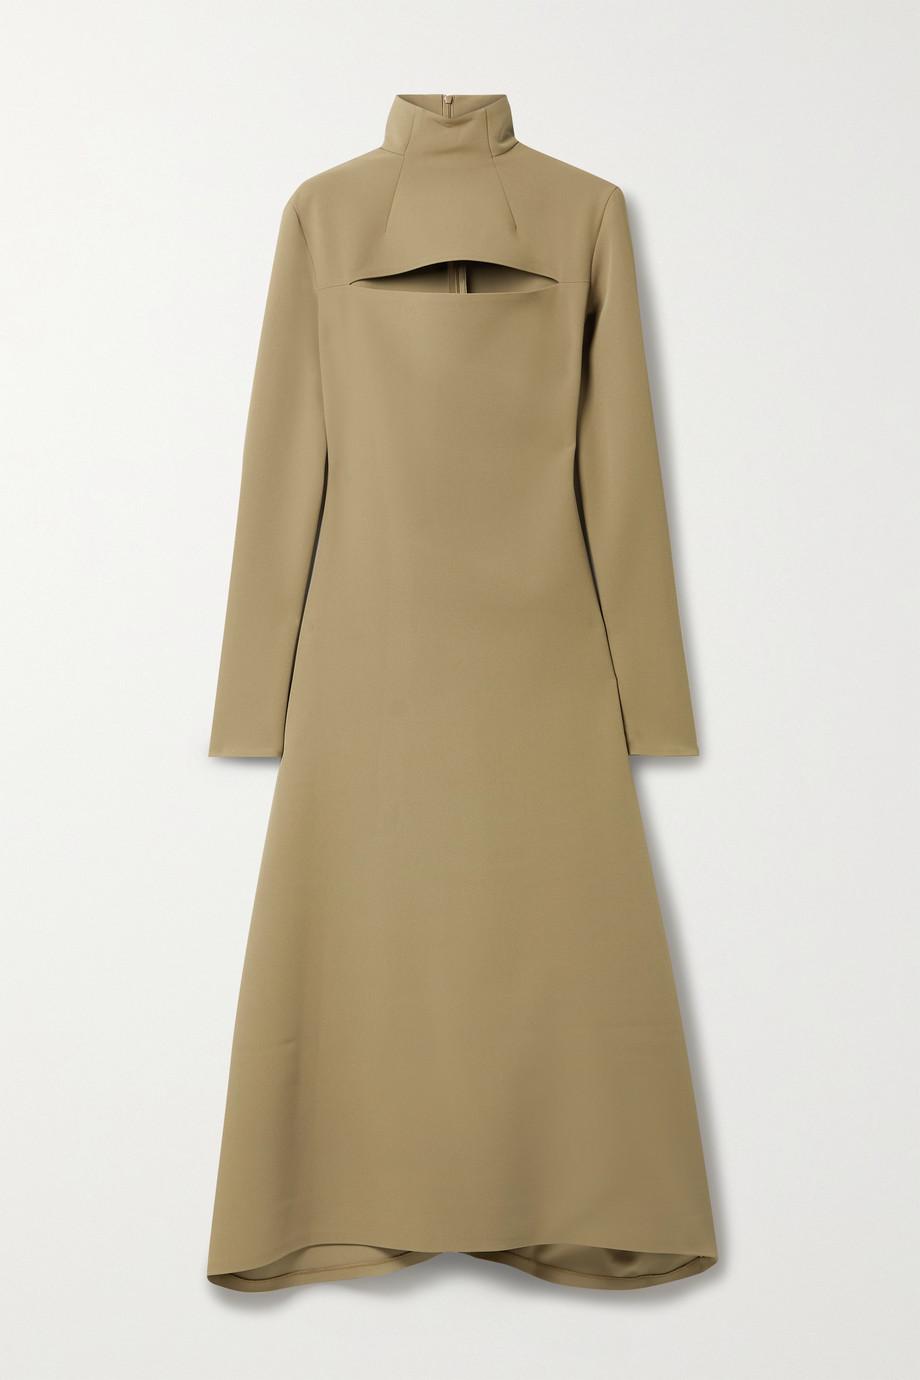 A.W.A.K.E. MODE Asymmetric cutout cady turtleneck dress